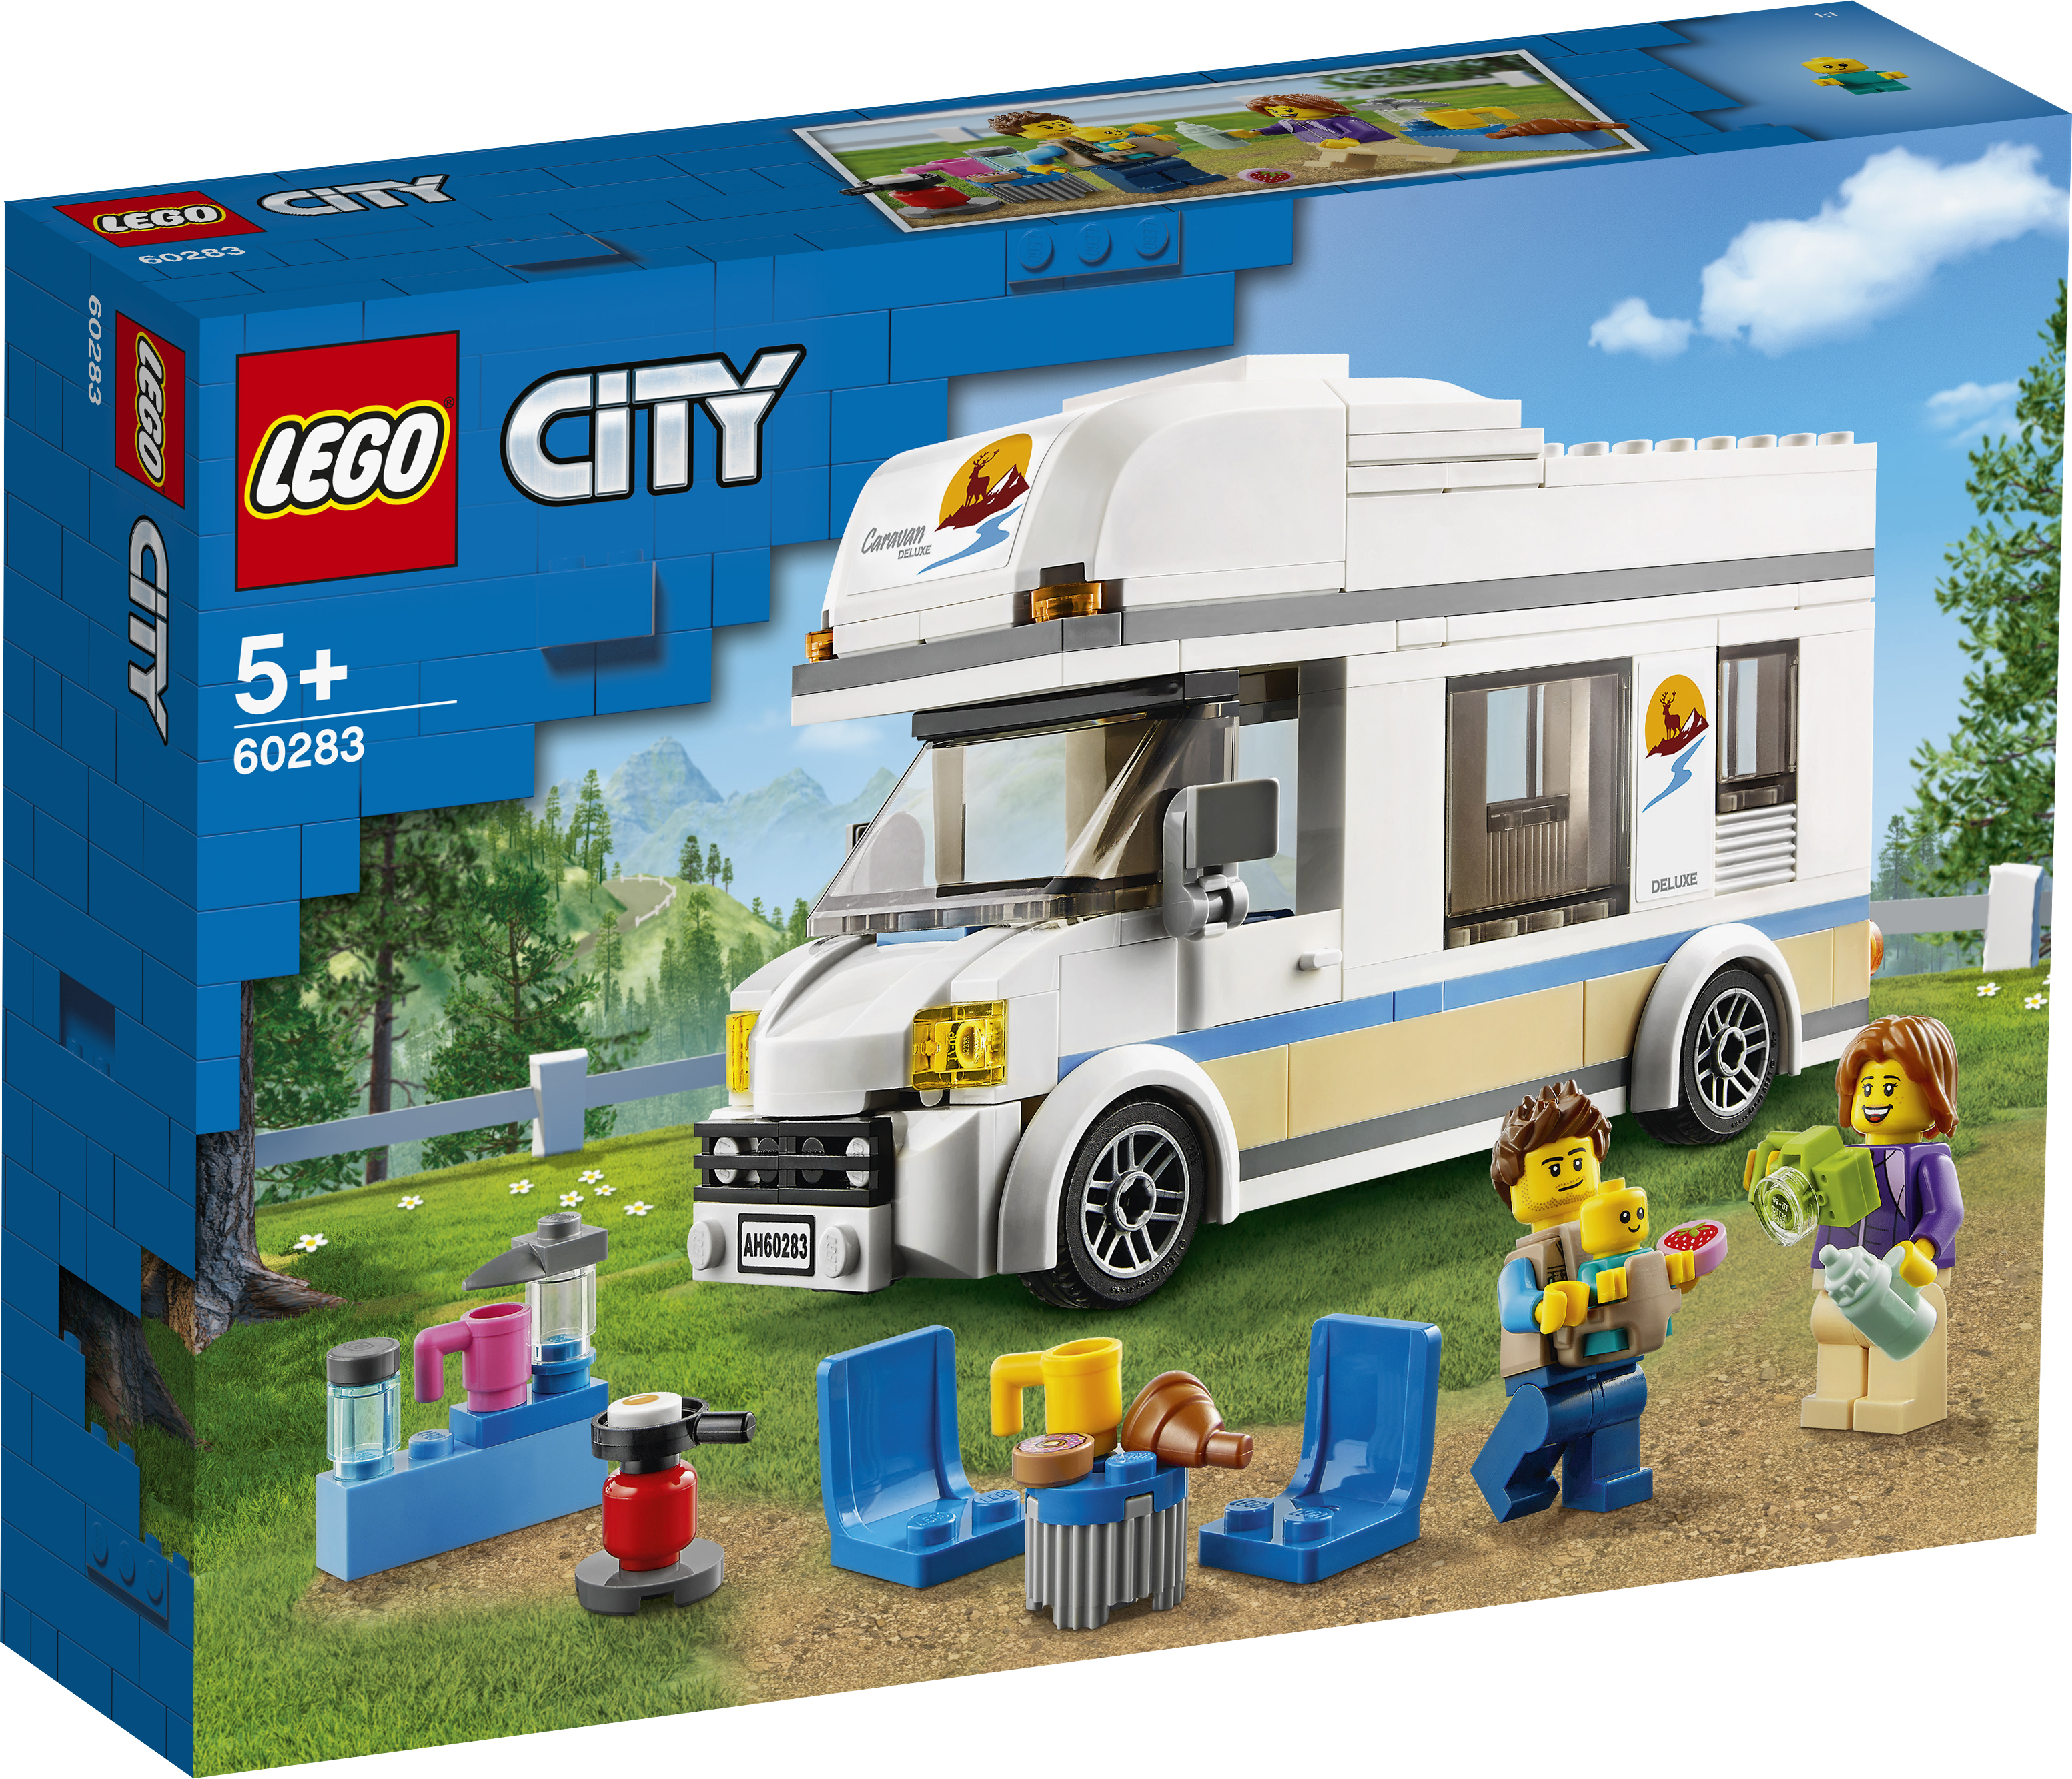 LEGO City Ferie-autocamper - 60283